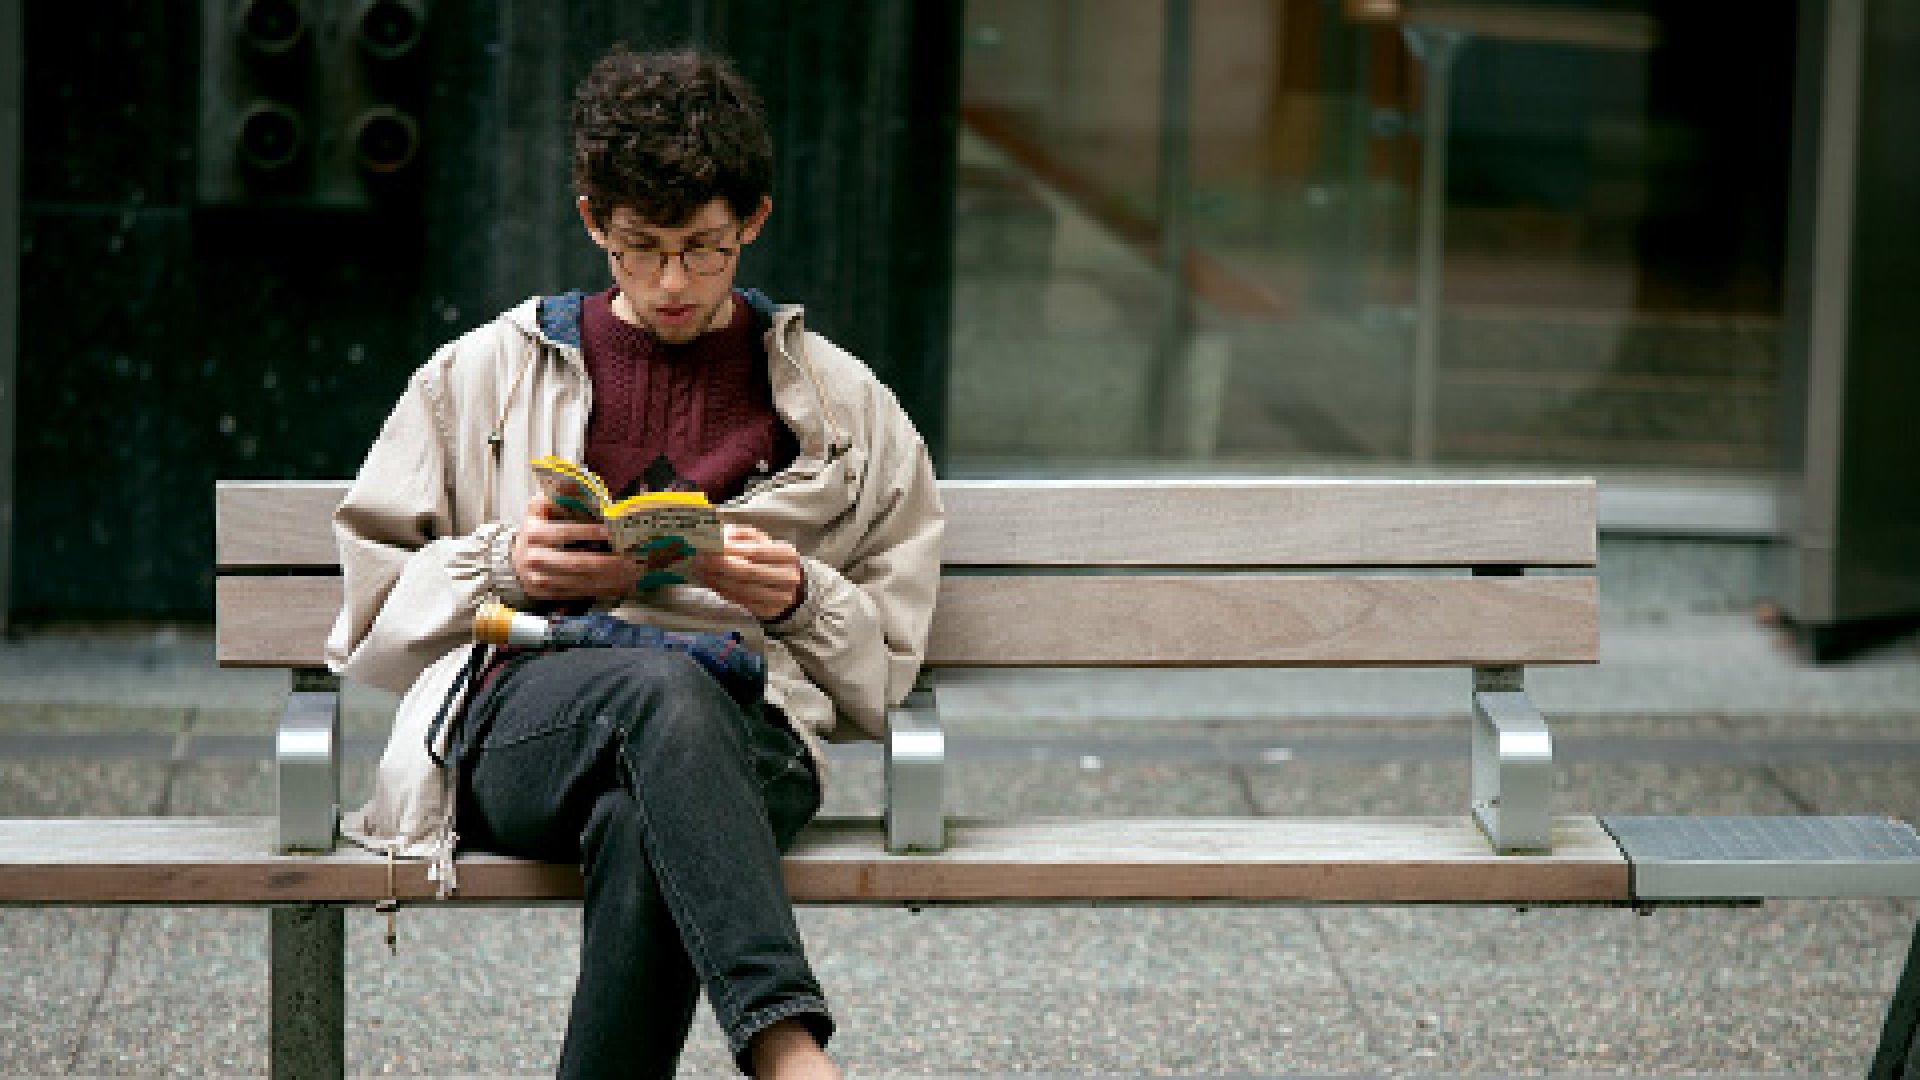 6 Books for the Well-Rounded Entrepreneur